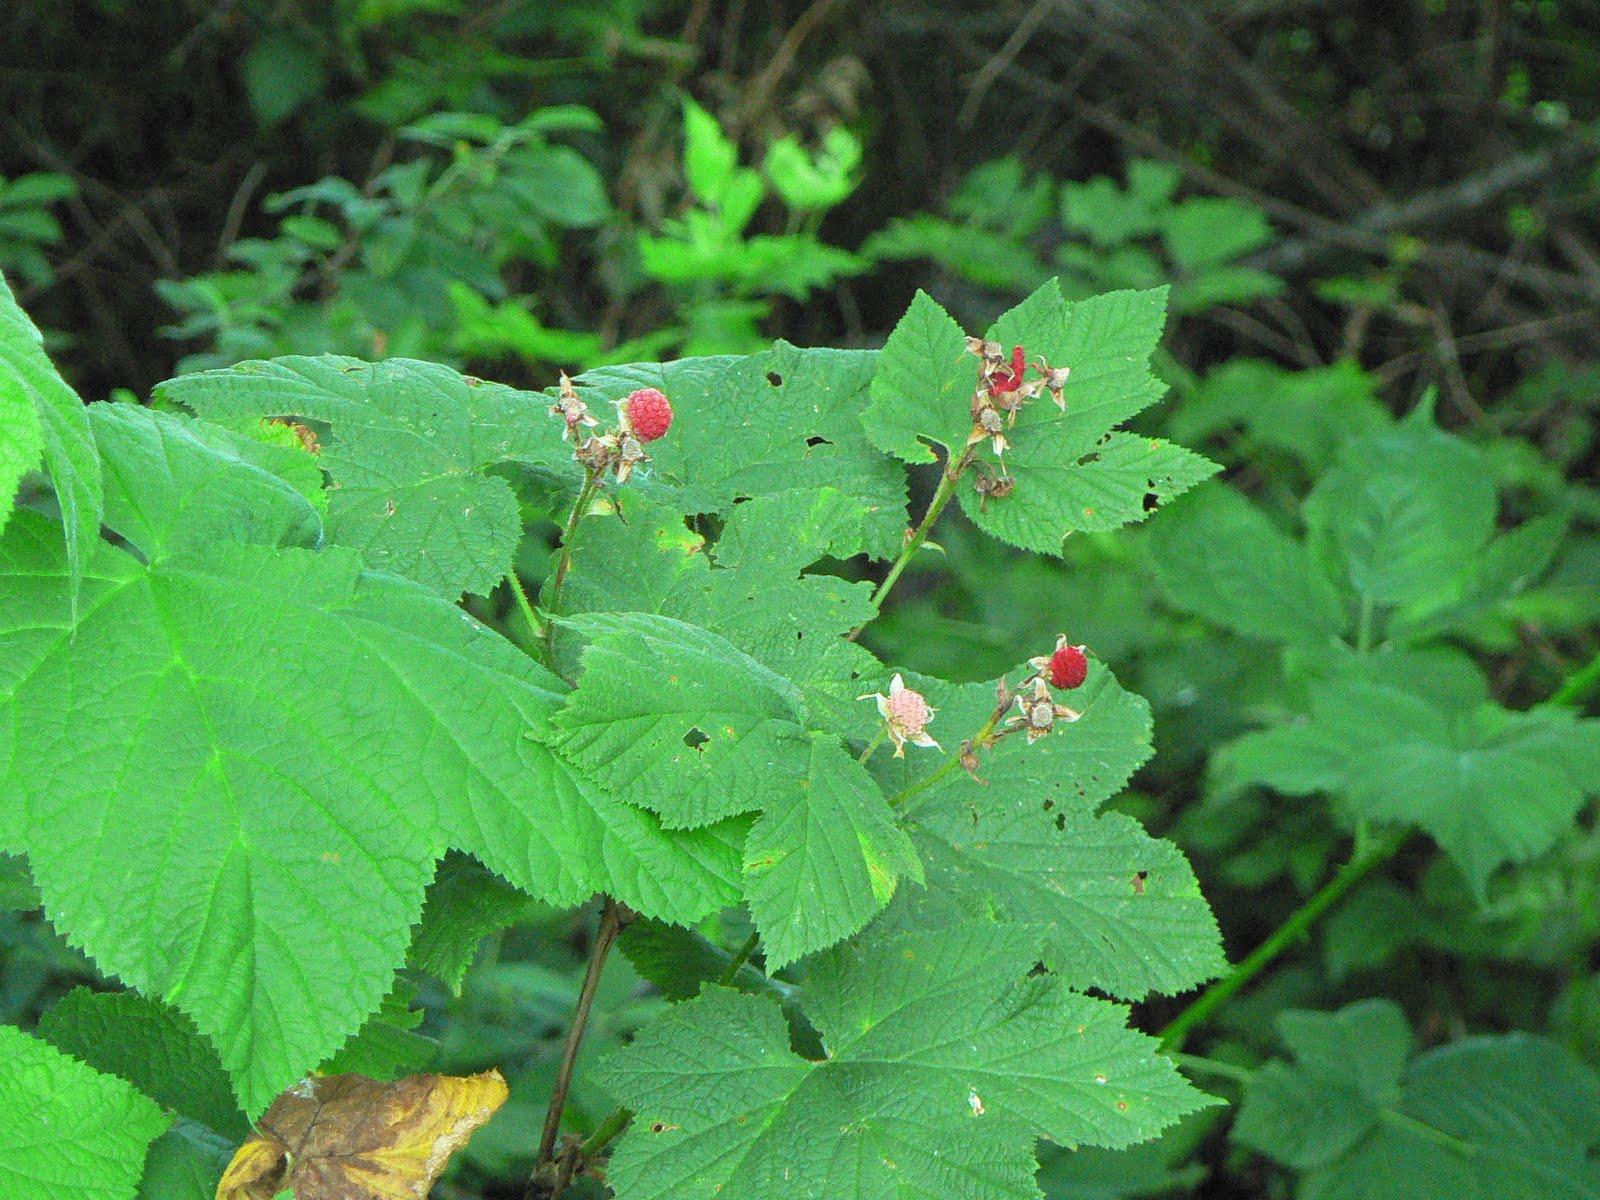 Laura S Blog Wild Berries In The Puget Sound